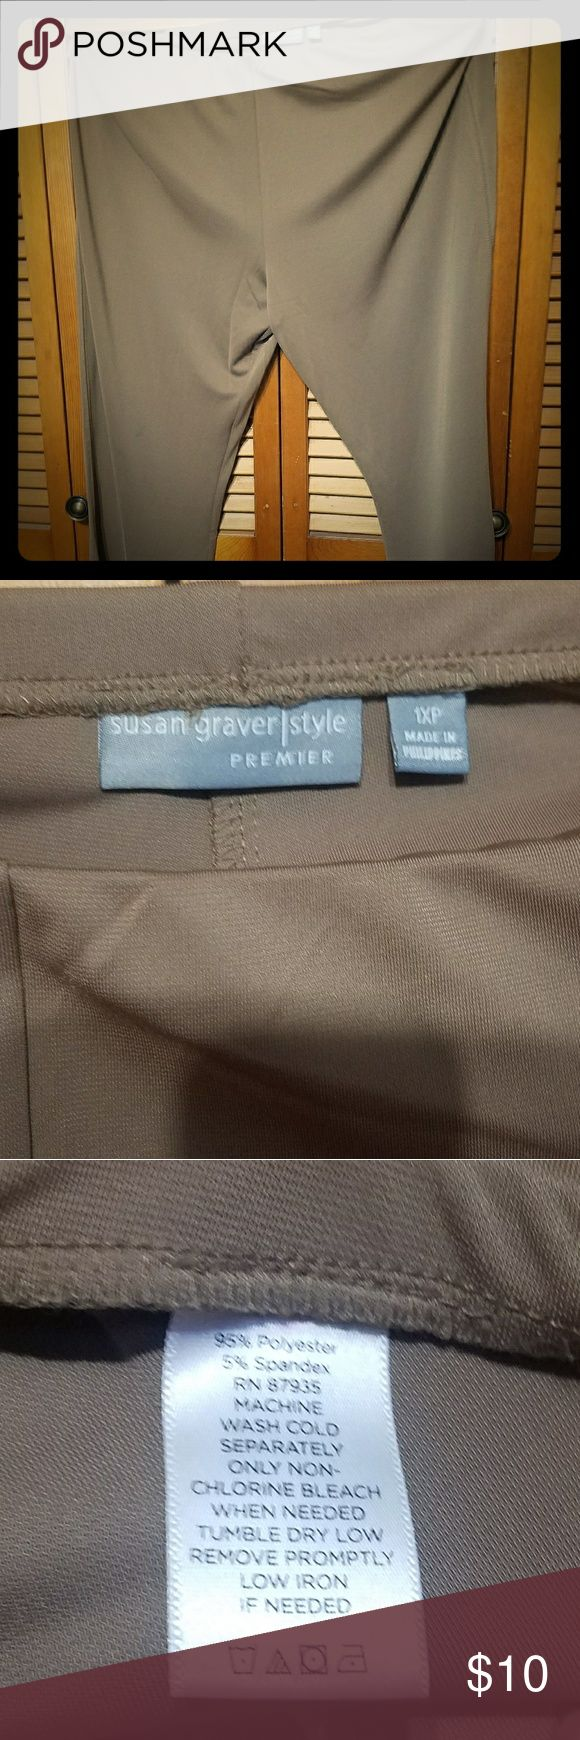 Olive green dress pants Stretchy elastic waistband Very comfortable Pxl Petite but little longer Pants